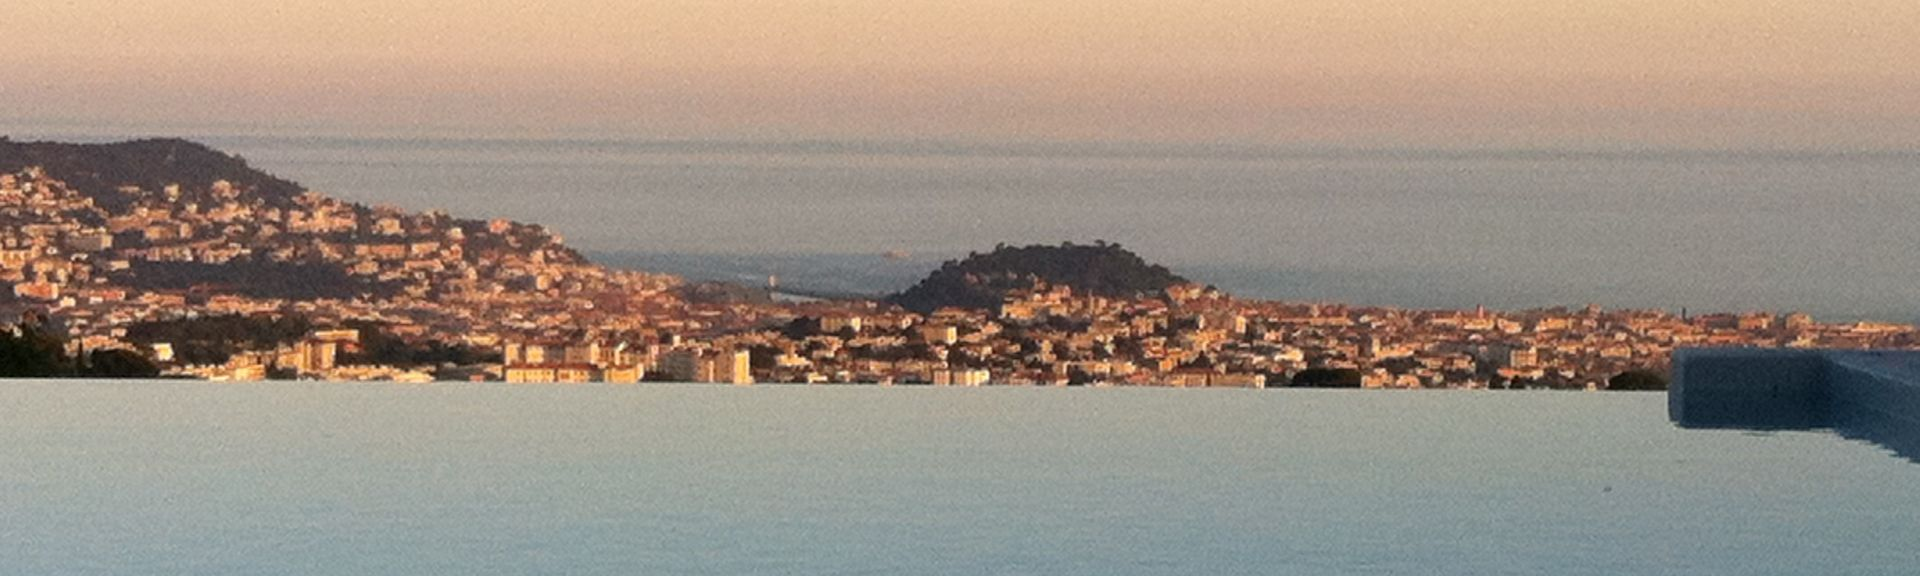 Carabacel, Nice, Alpes-Maritimes, France